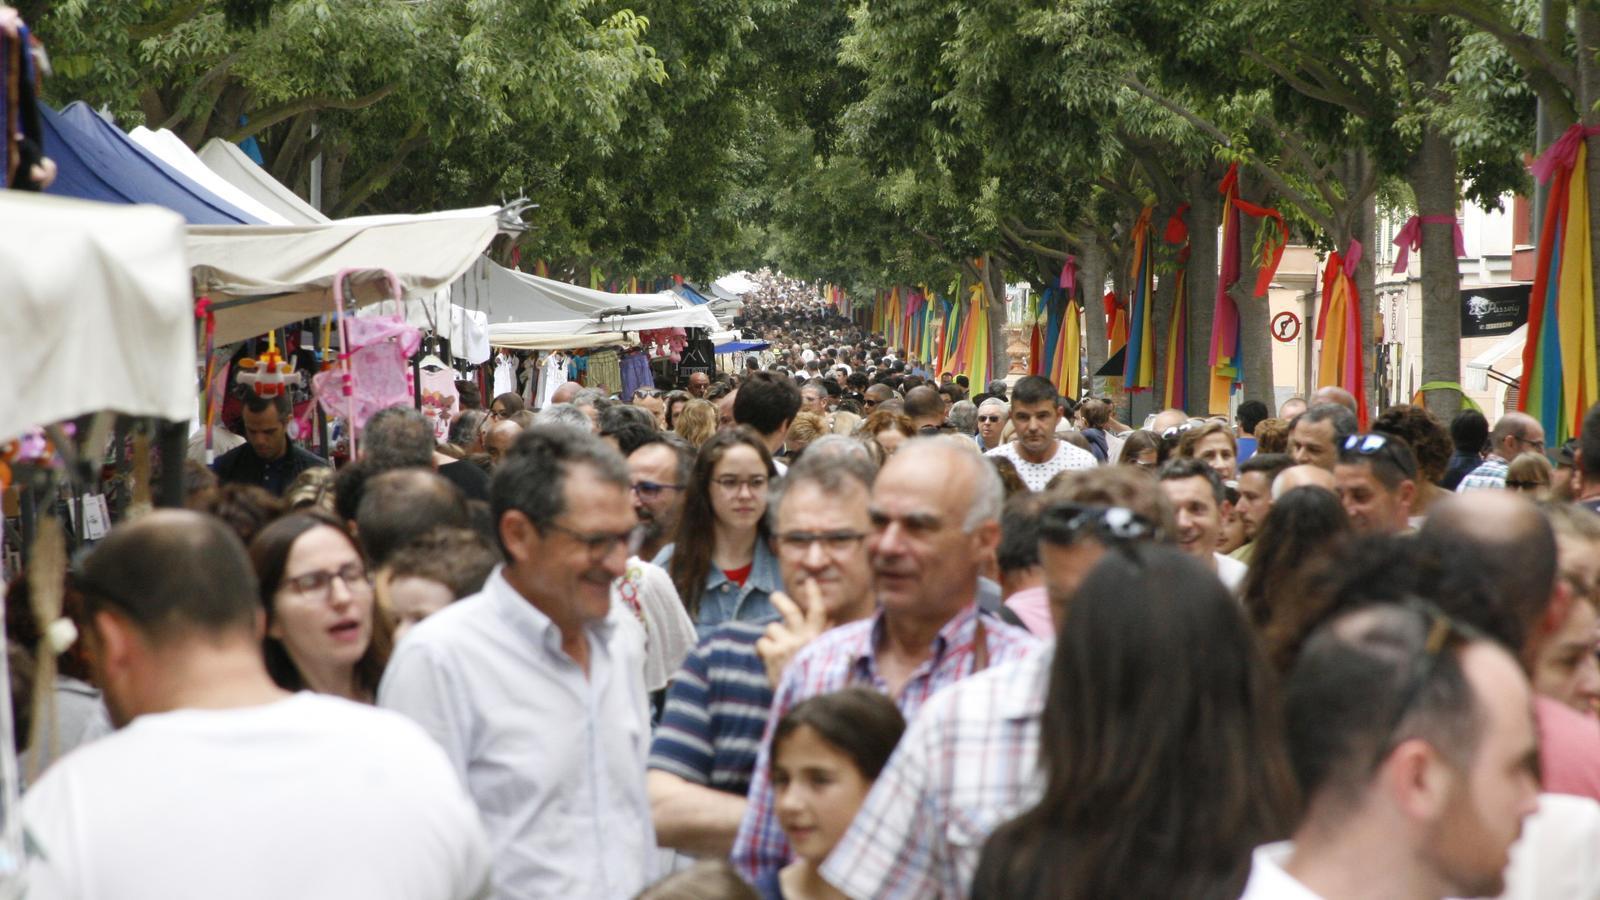 El municipi de Manacor ha incrementat la població de forma notable.